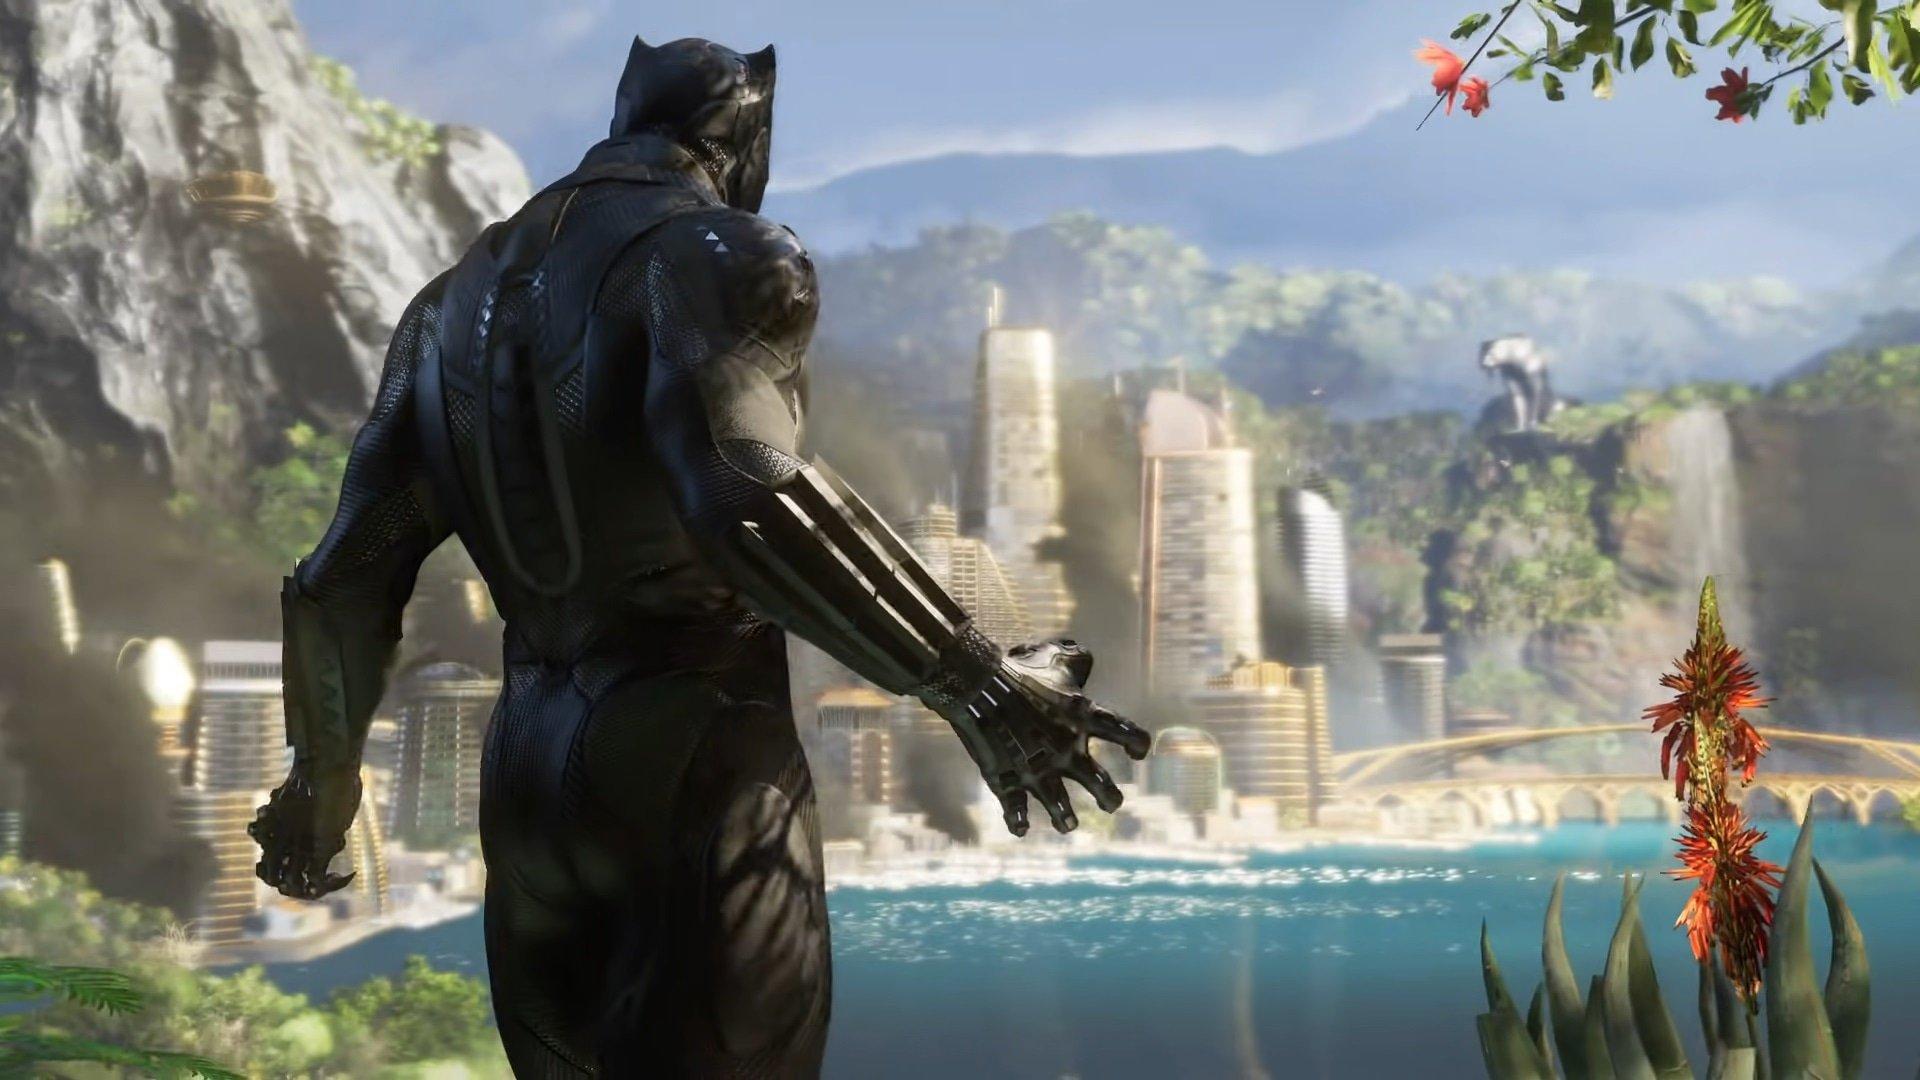 Date de sortie de Marvel Avengers War pour Wakanda